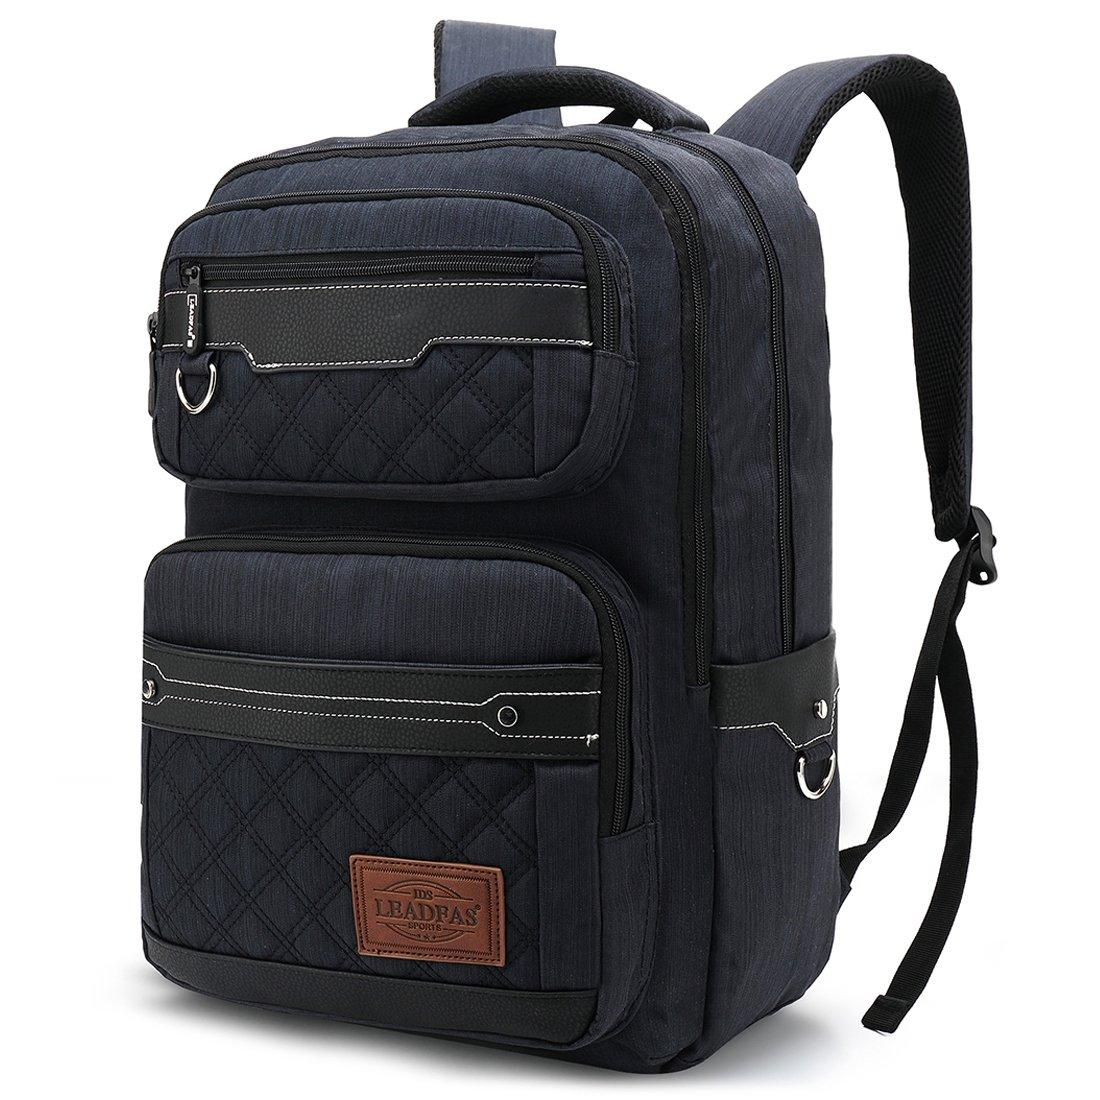 Water Resistant Backpack High School Big Student Bookbag 15 Inch Laptop Bag (Black)